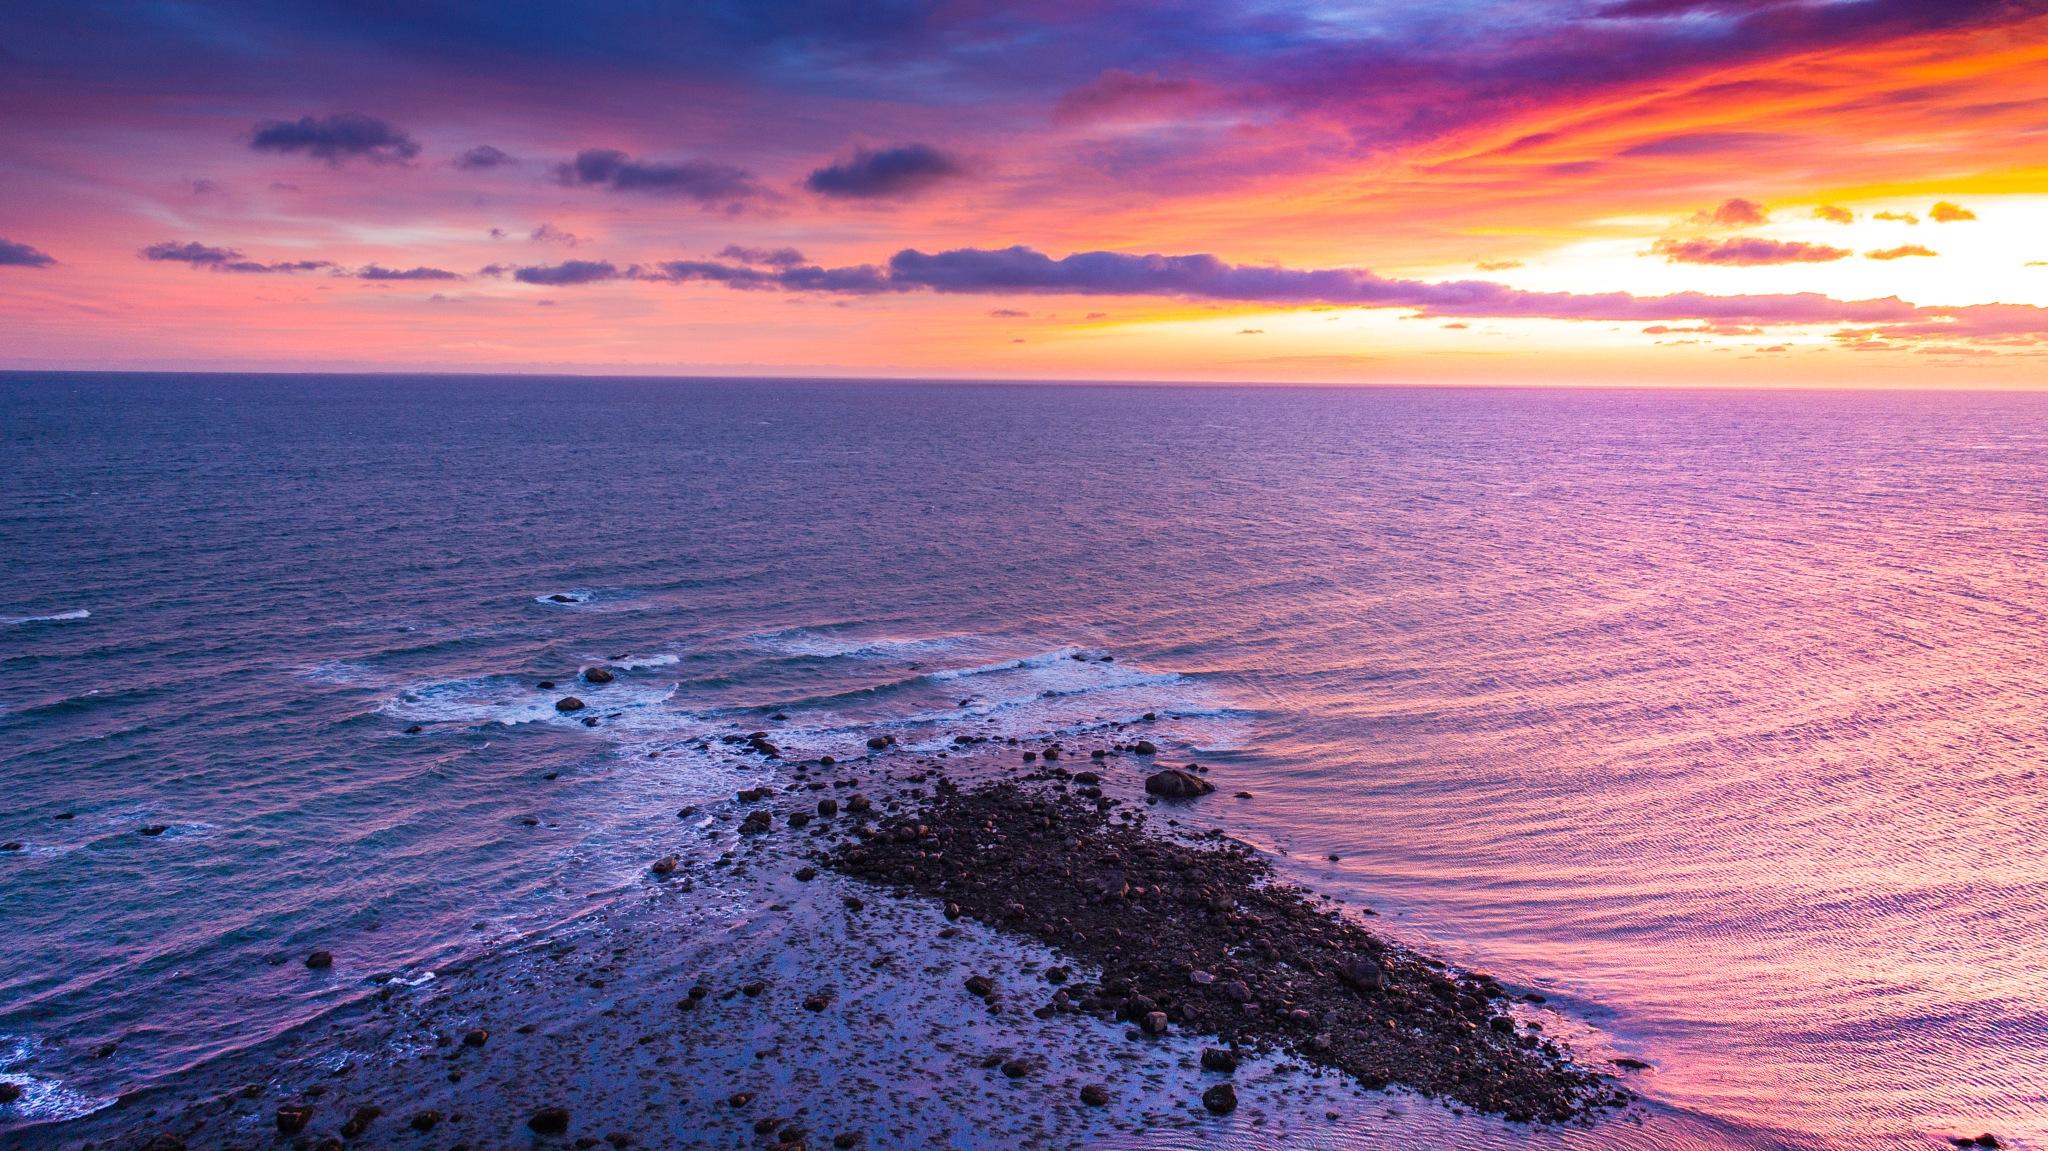 Sunrise at Manomet Point by HawkVisuals